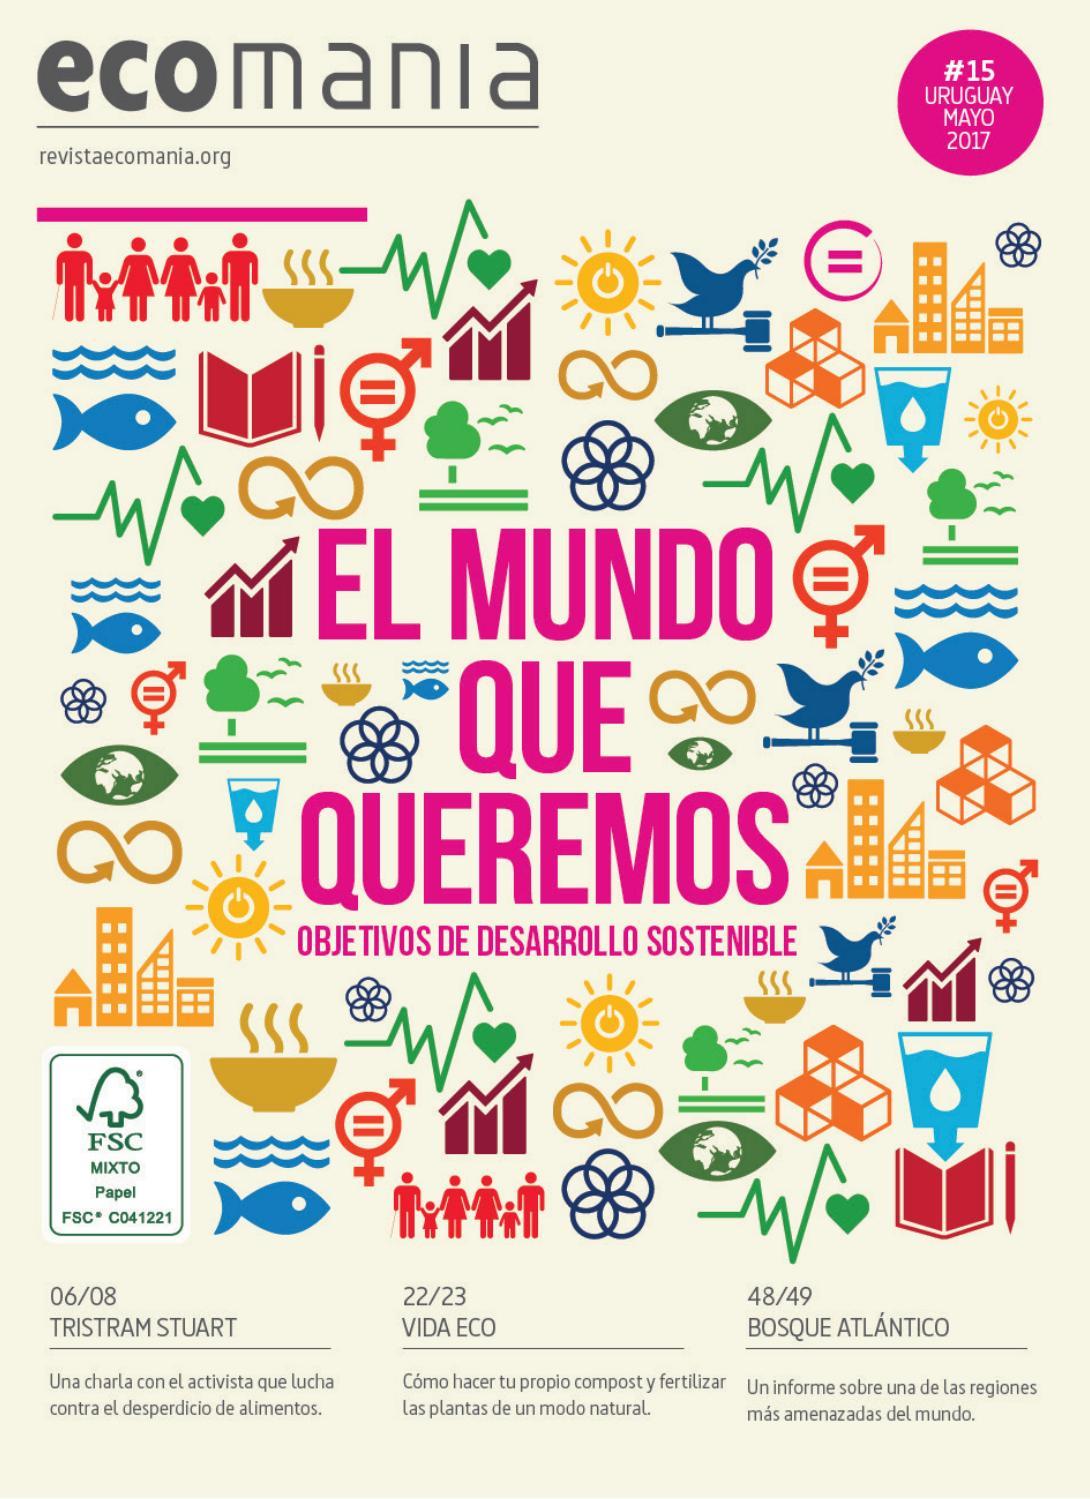 ECOMANÍA URUGUAY #15 // MAYO 2017 by Ecomania - issuu